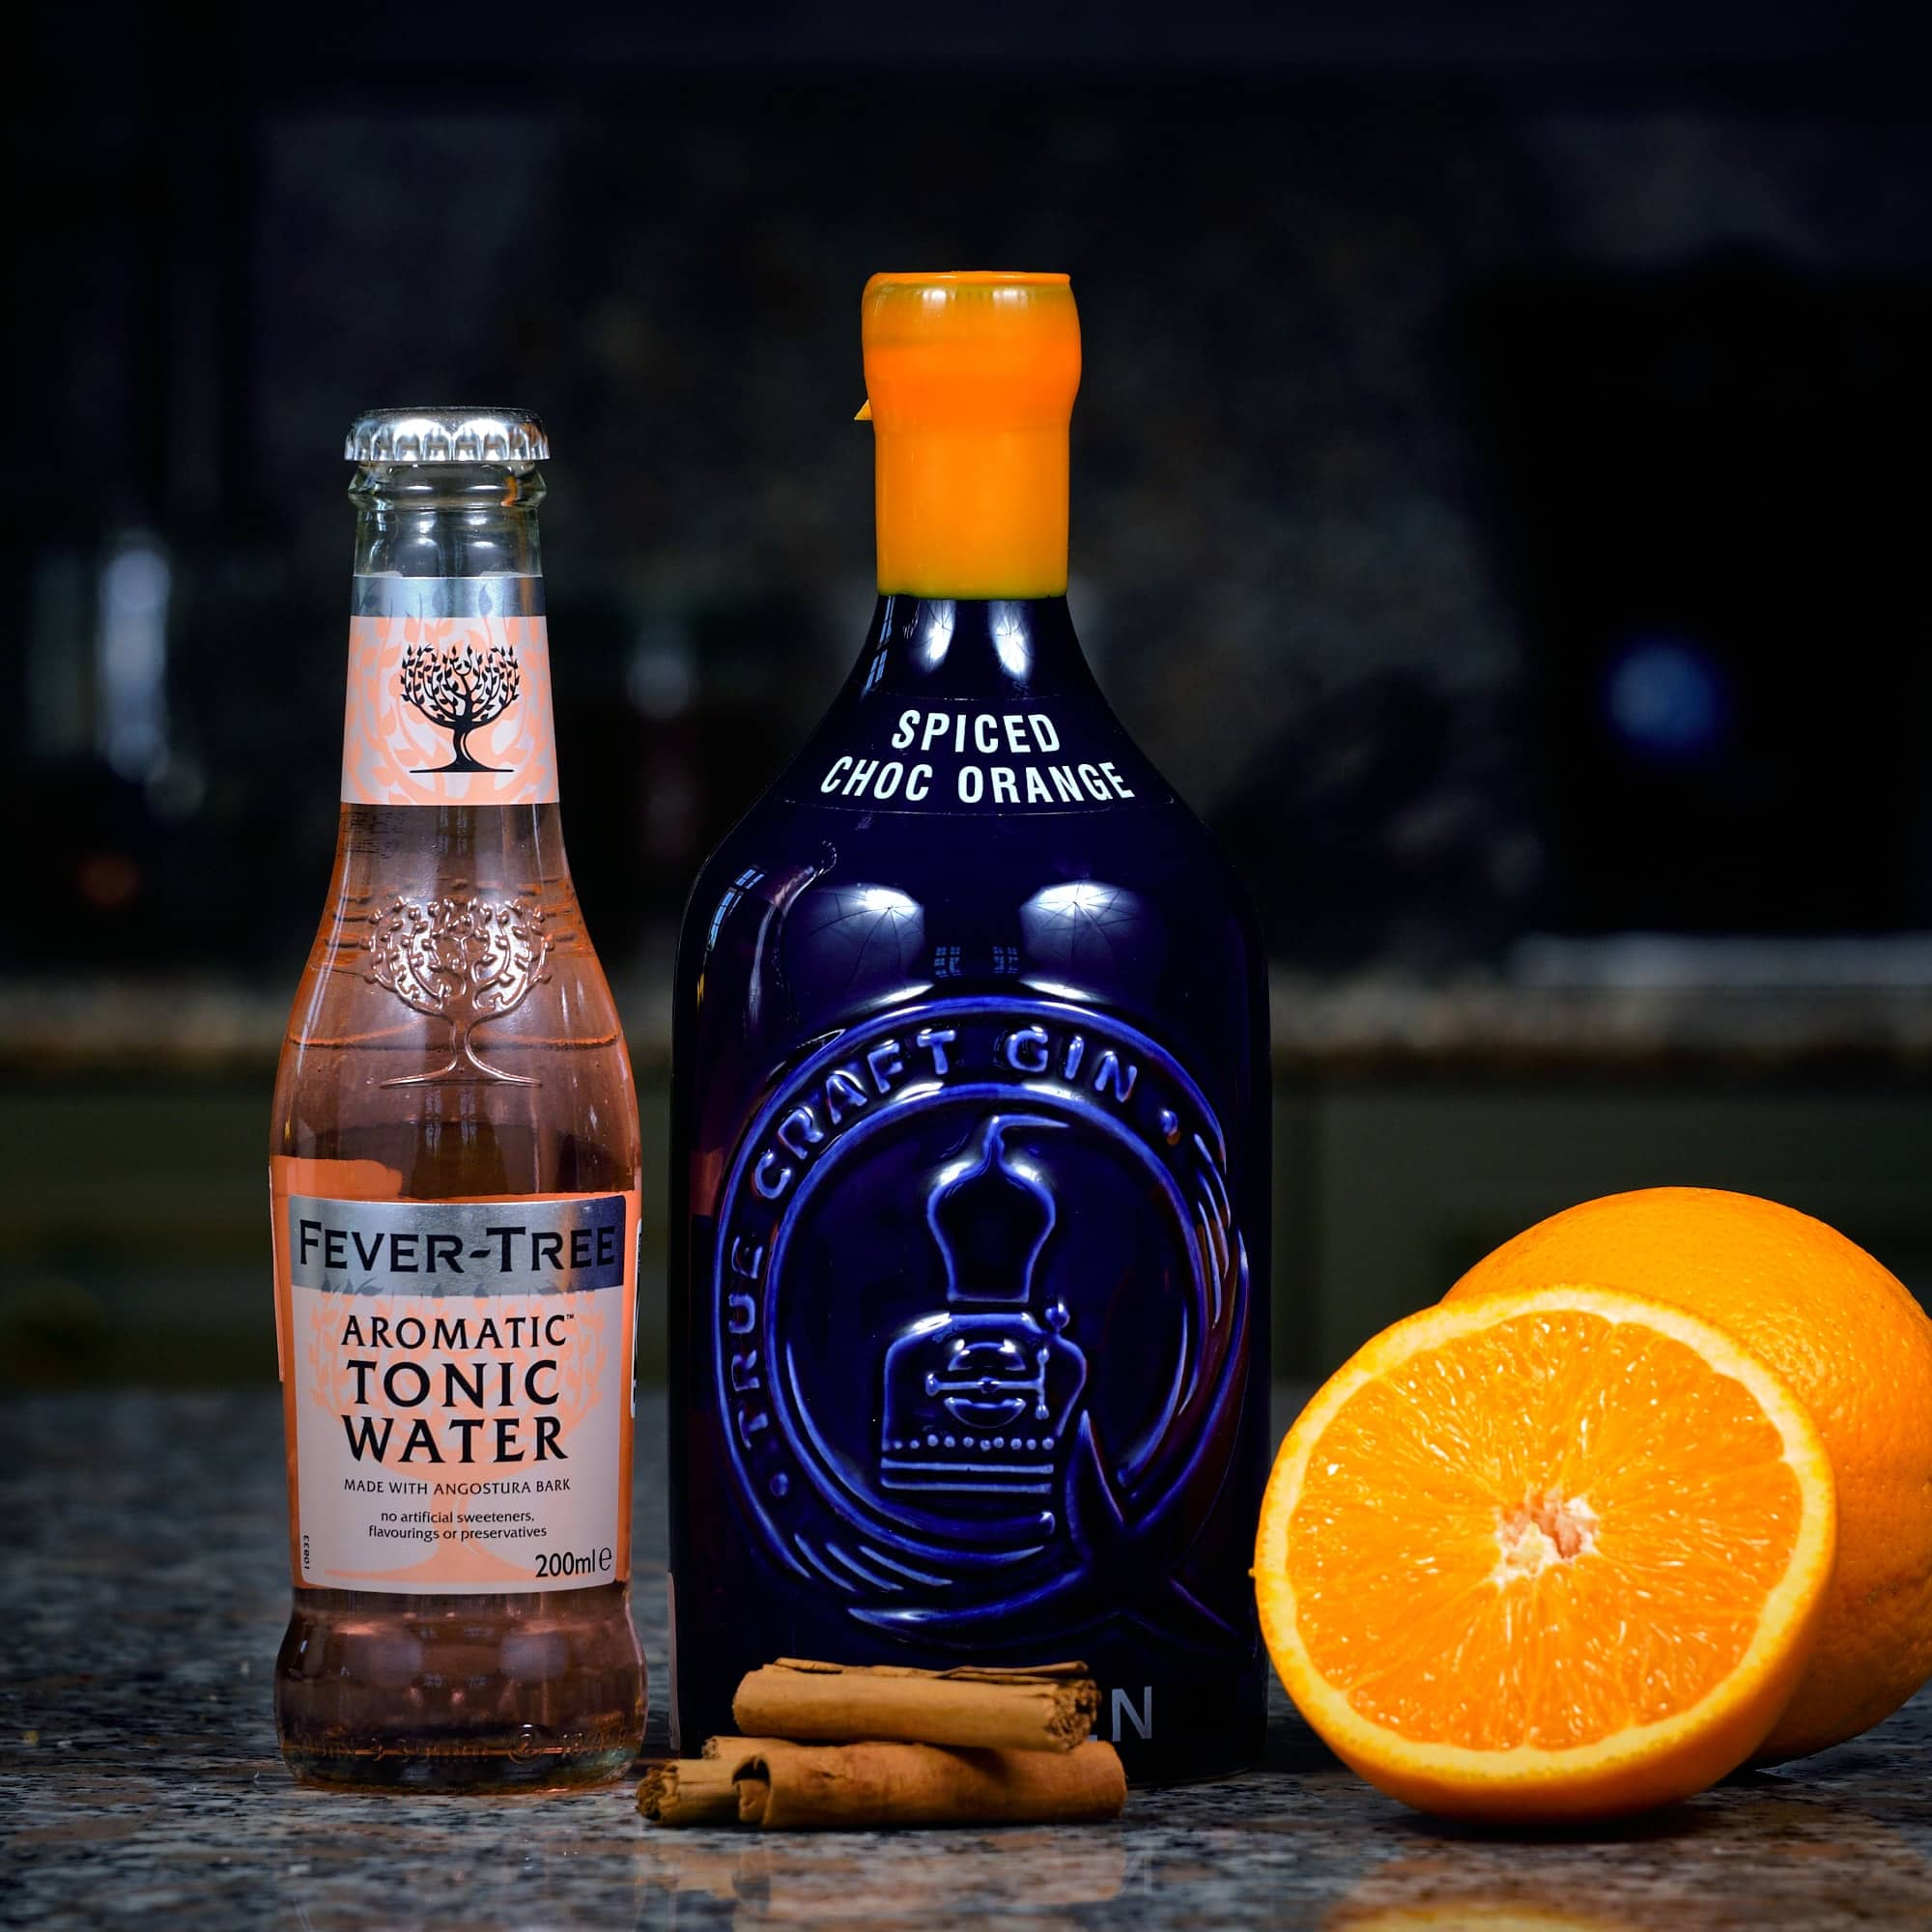 Mcqueens Spiced Chocolate Orange Gin